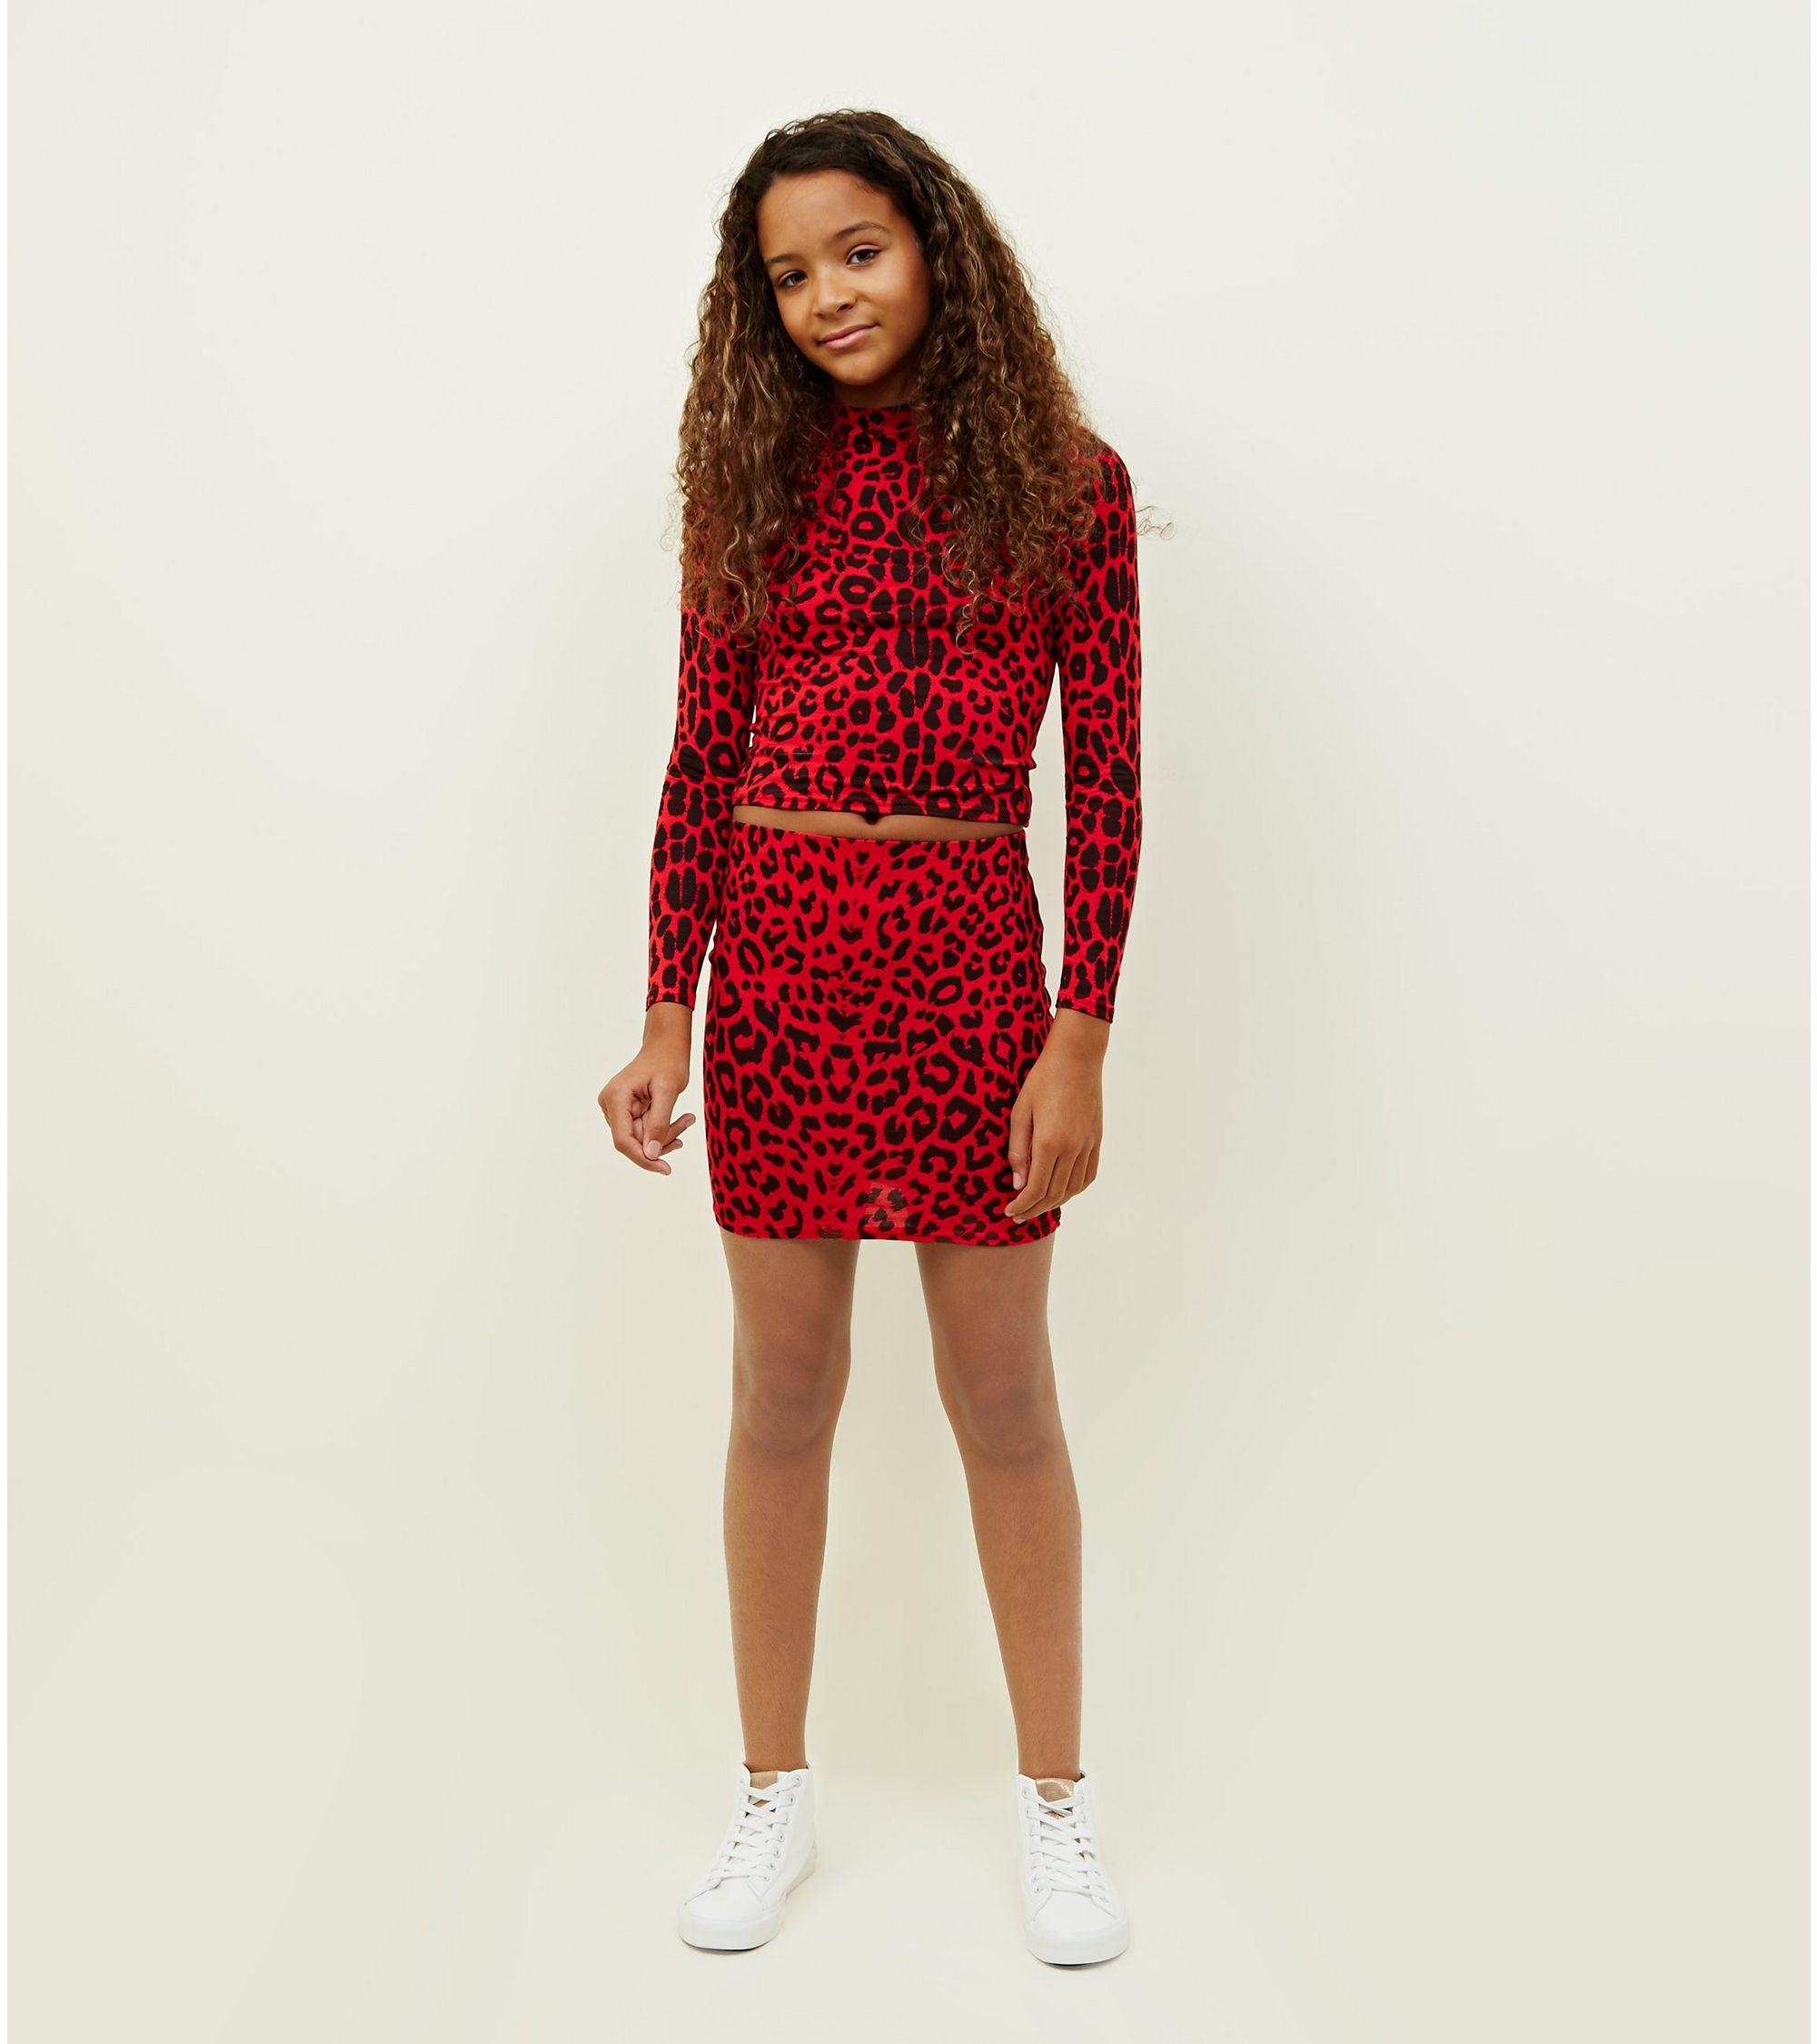 e26c77ba58 New Look Girls Red Leopard Print Tube Skirt at £4   love the brands